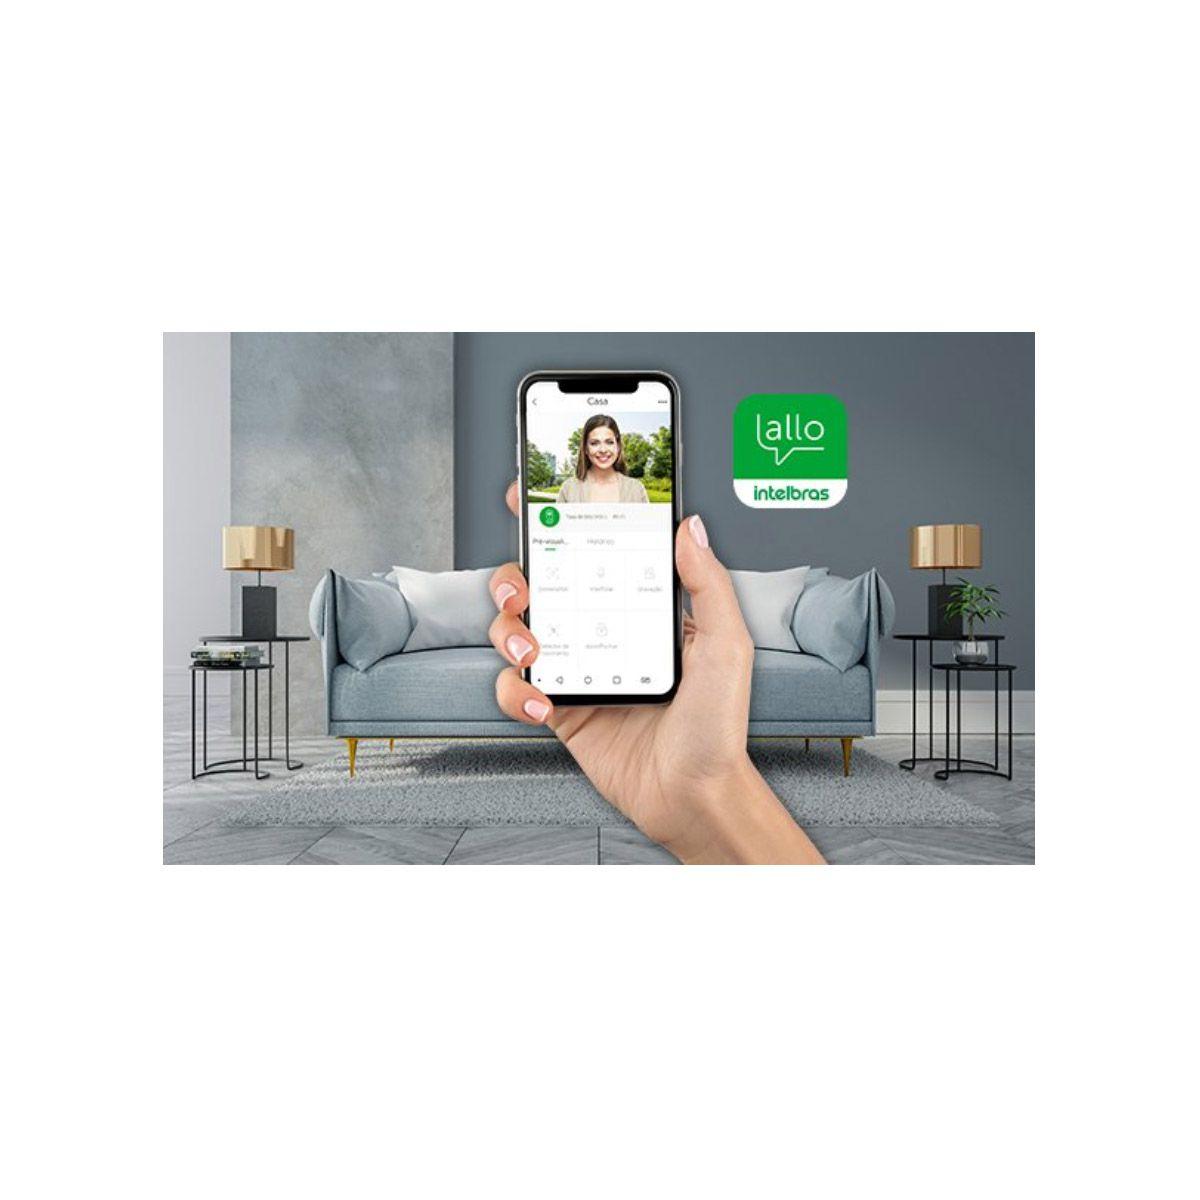 Allo w3 Videoporteiro Wi-Fi Vídeo Foto Sensor Presença Visão Noturna